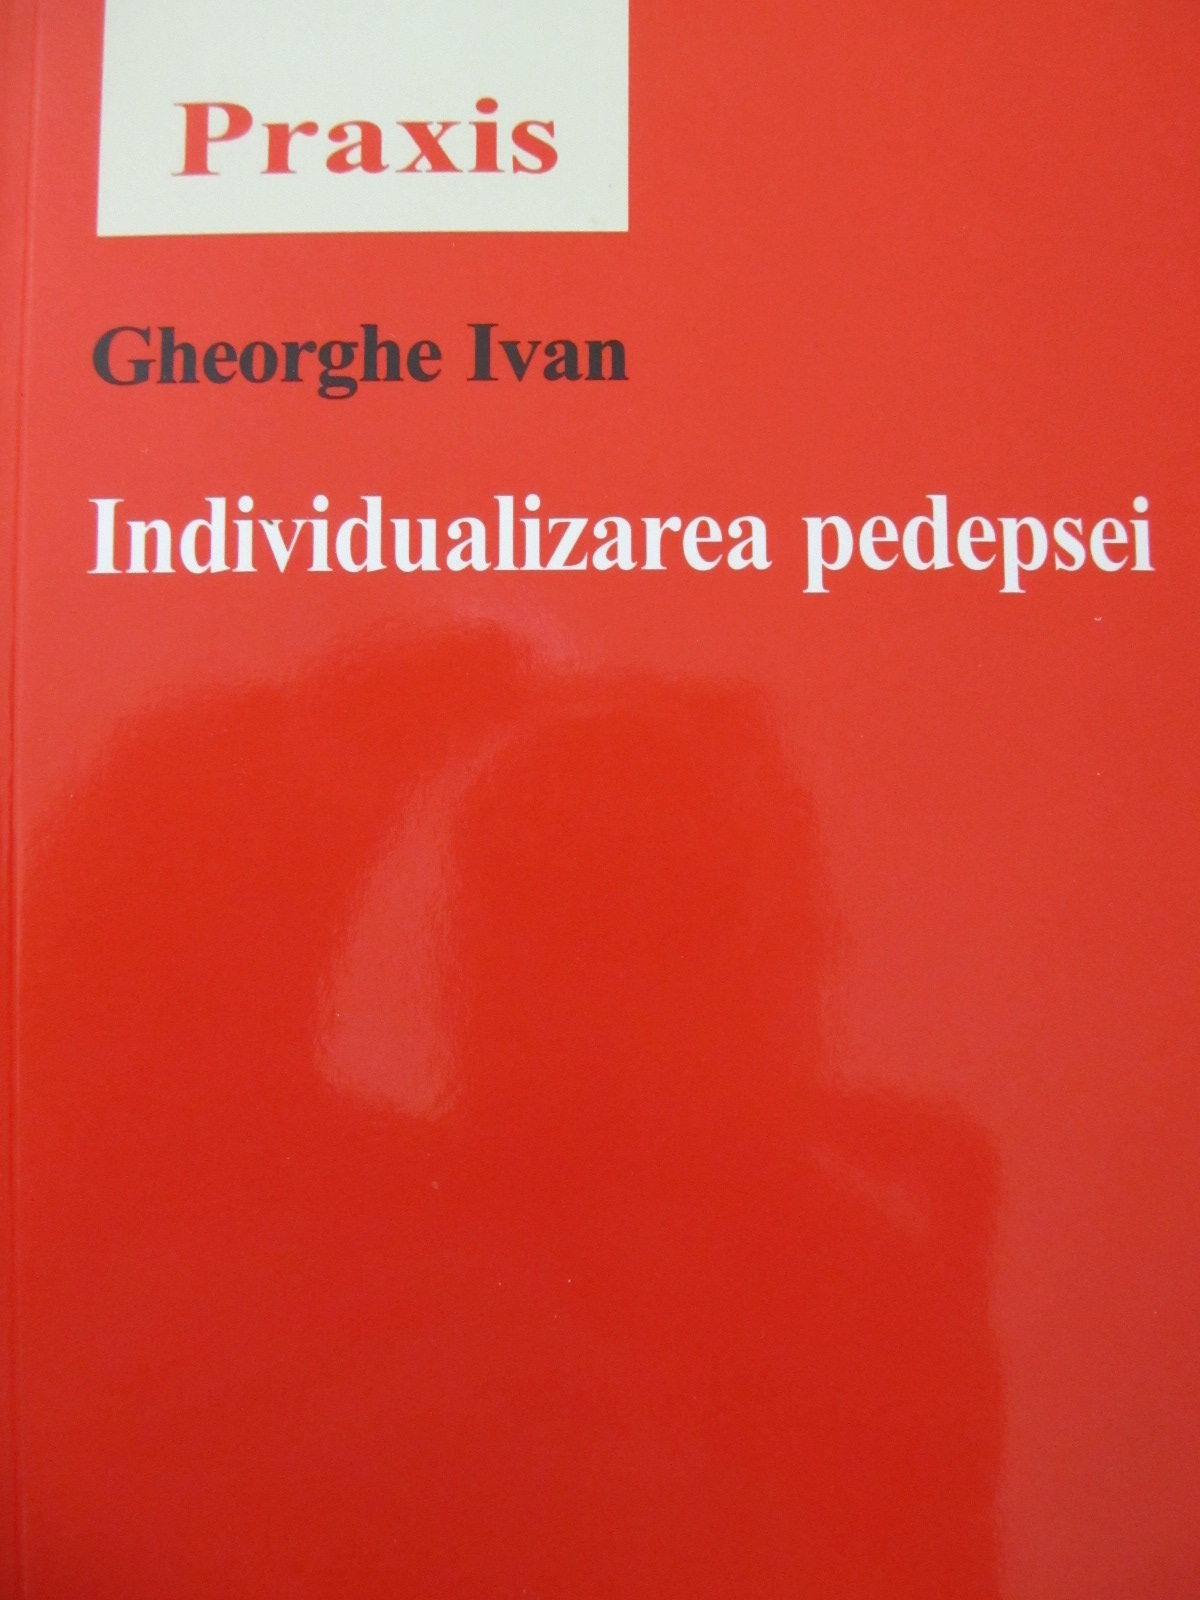 Individualizarea pedepsei - Gheorghe Ivan | Detalii carte